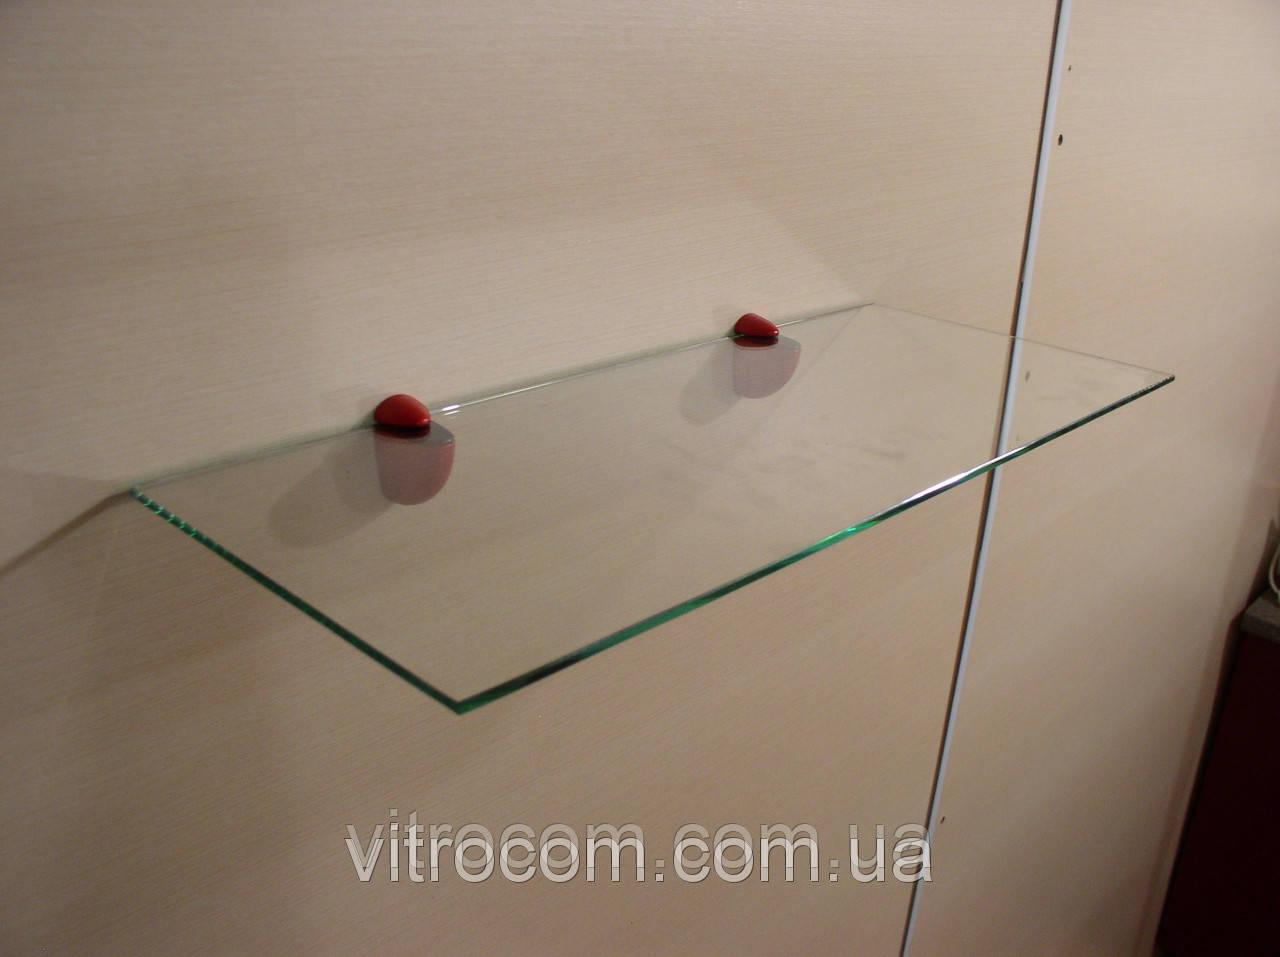 Полка стеклянная прямая 6 мм прозрачная 60 х 12 см